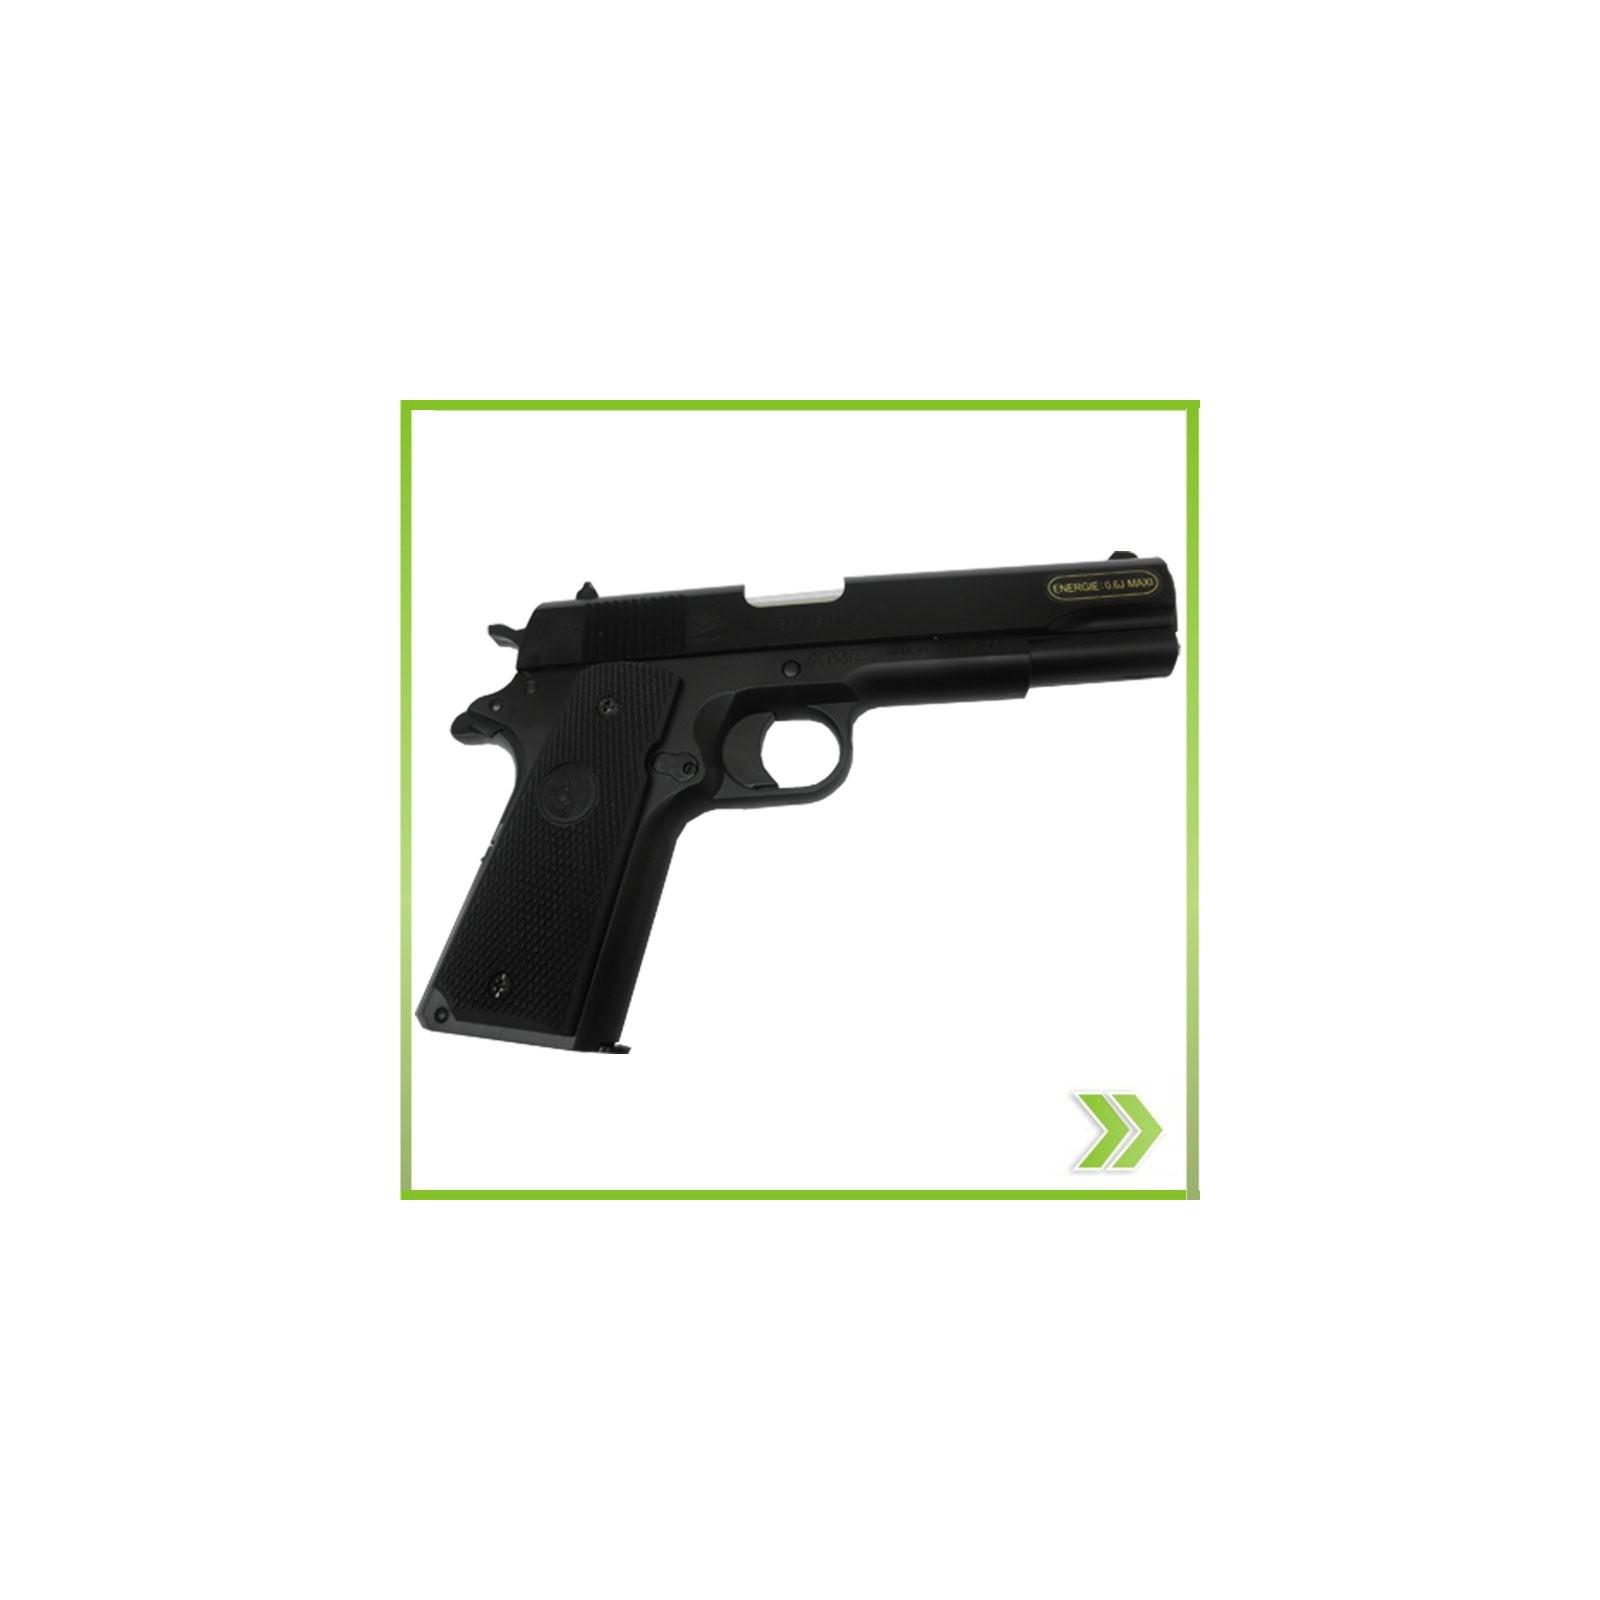 Pistola Airsoft KWC1911 replica 45 Resorte Polimero nuevo sistema ...